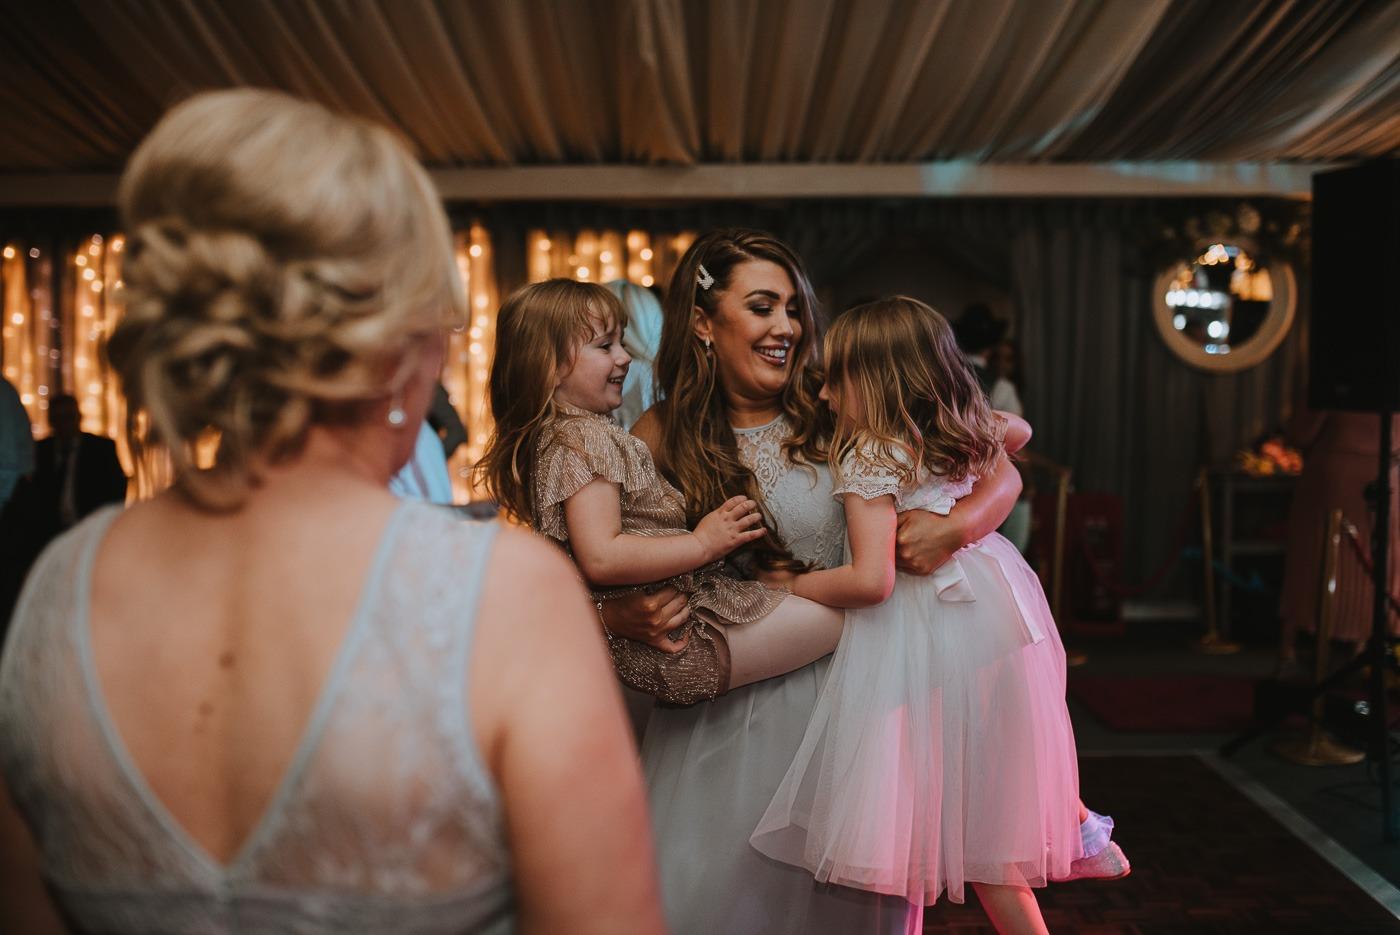 A woman in a wedding dress